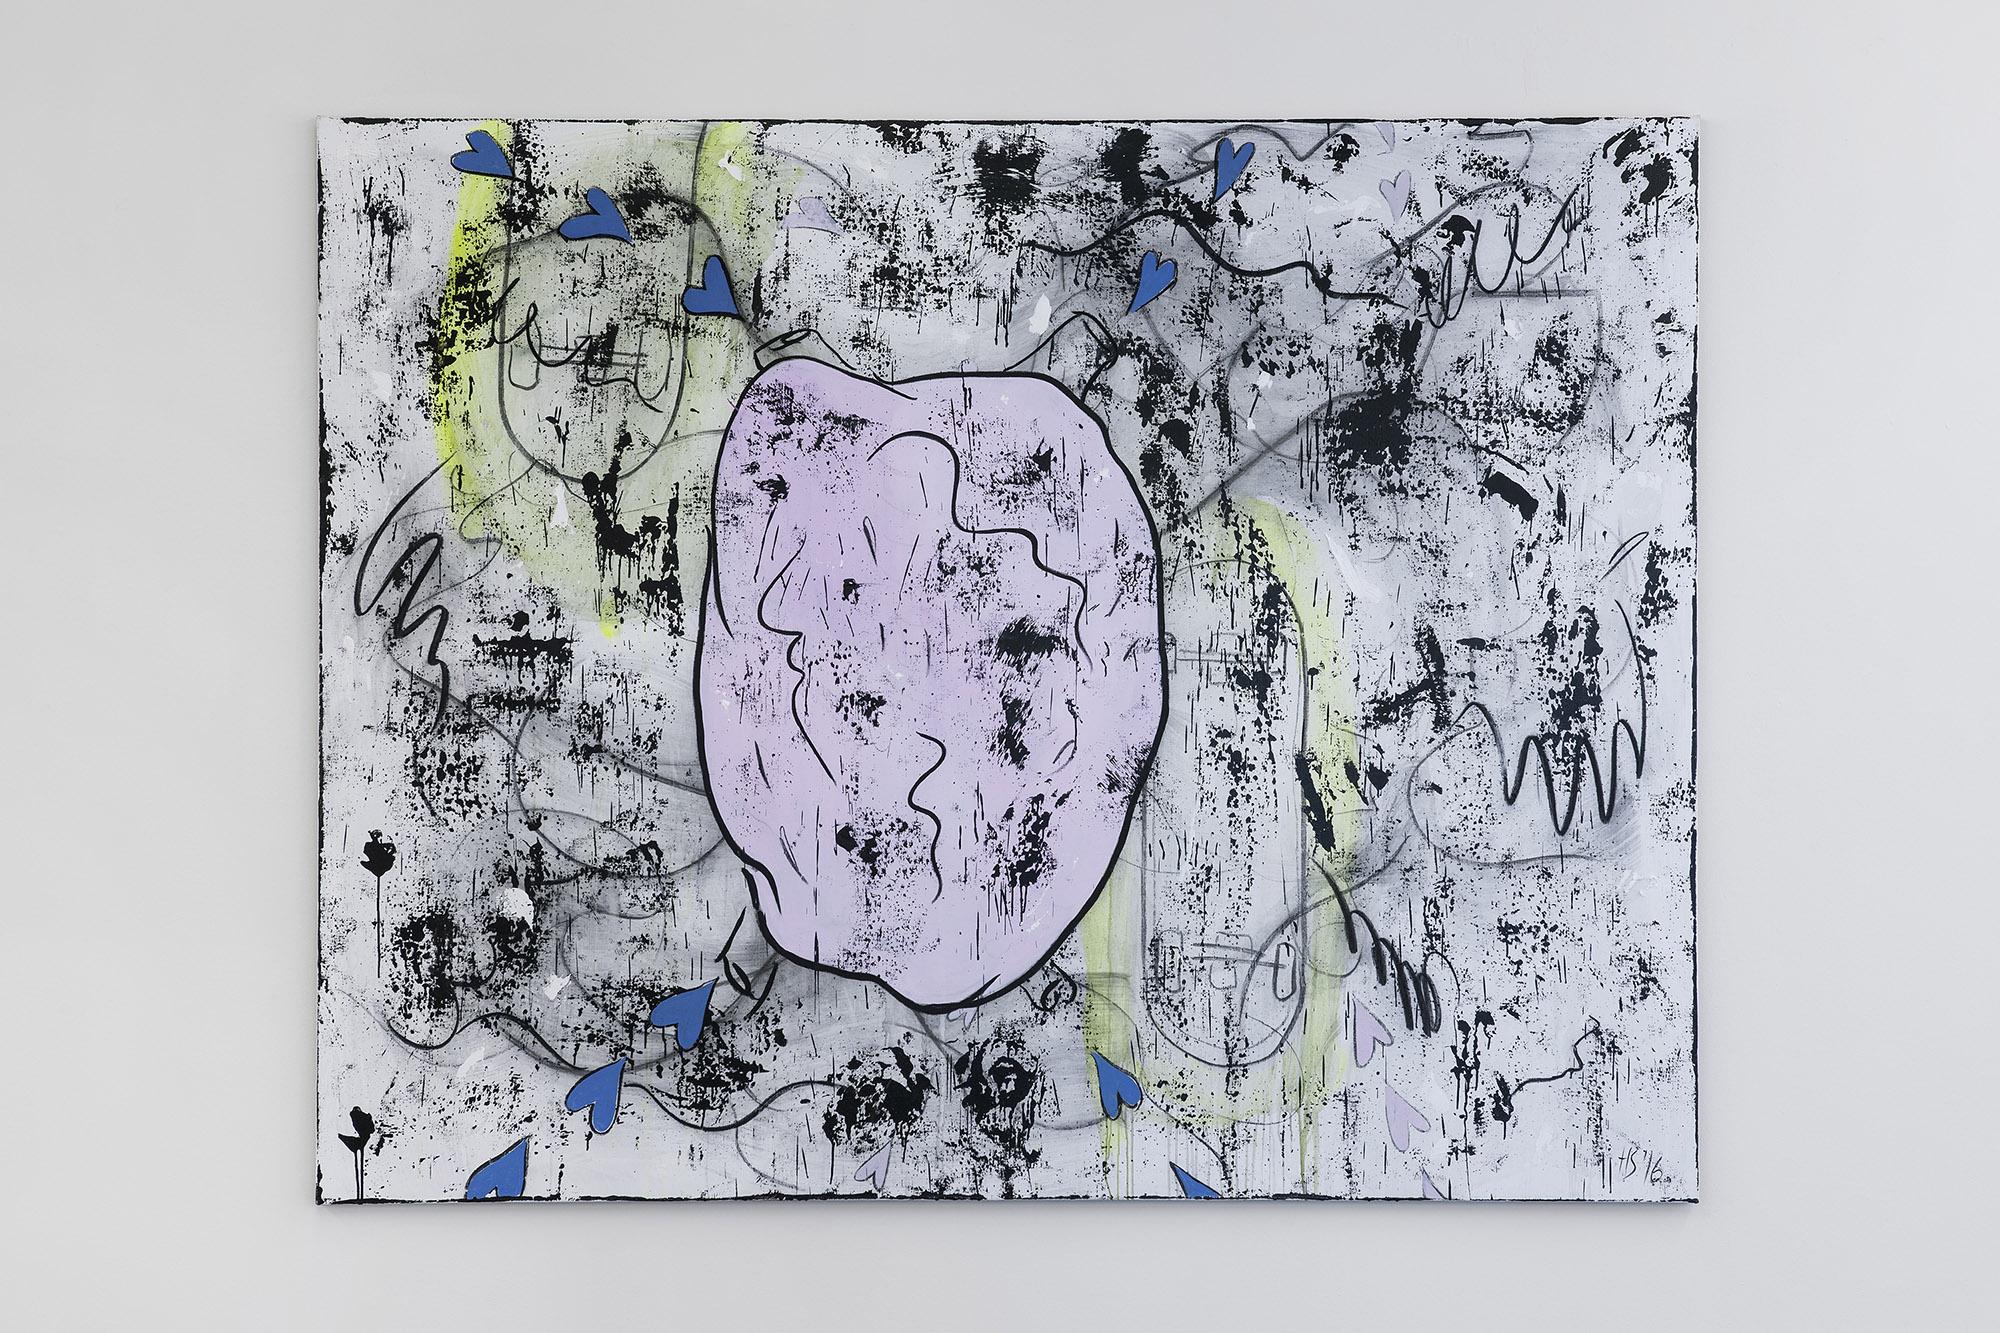 15 - Henning Strassburger at Kunstverein Reutlingen